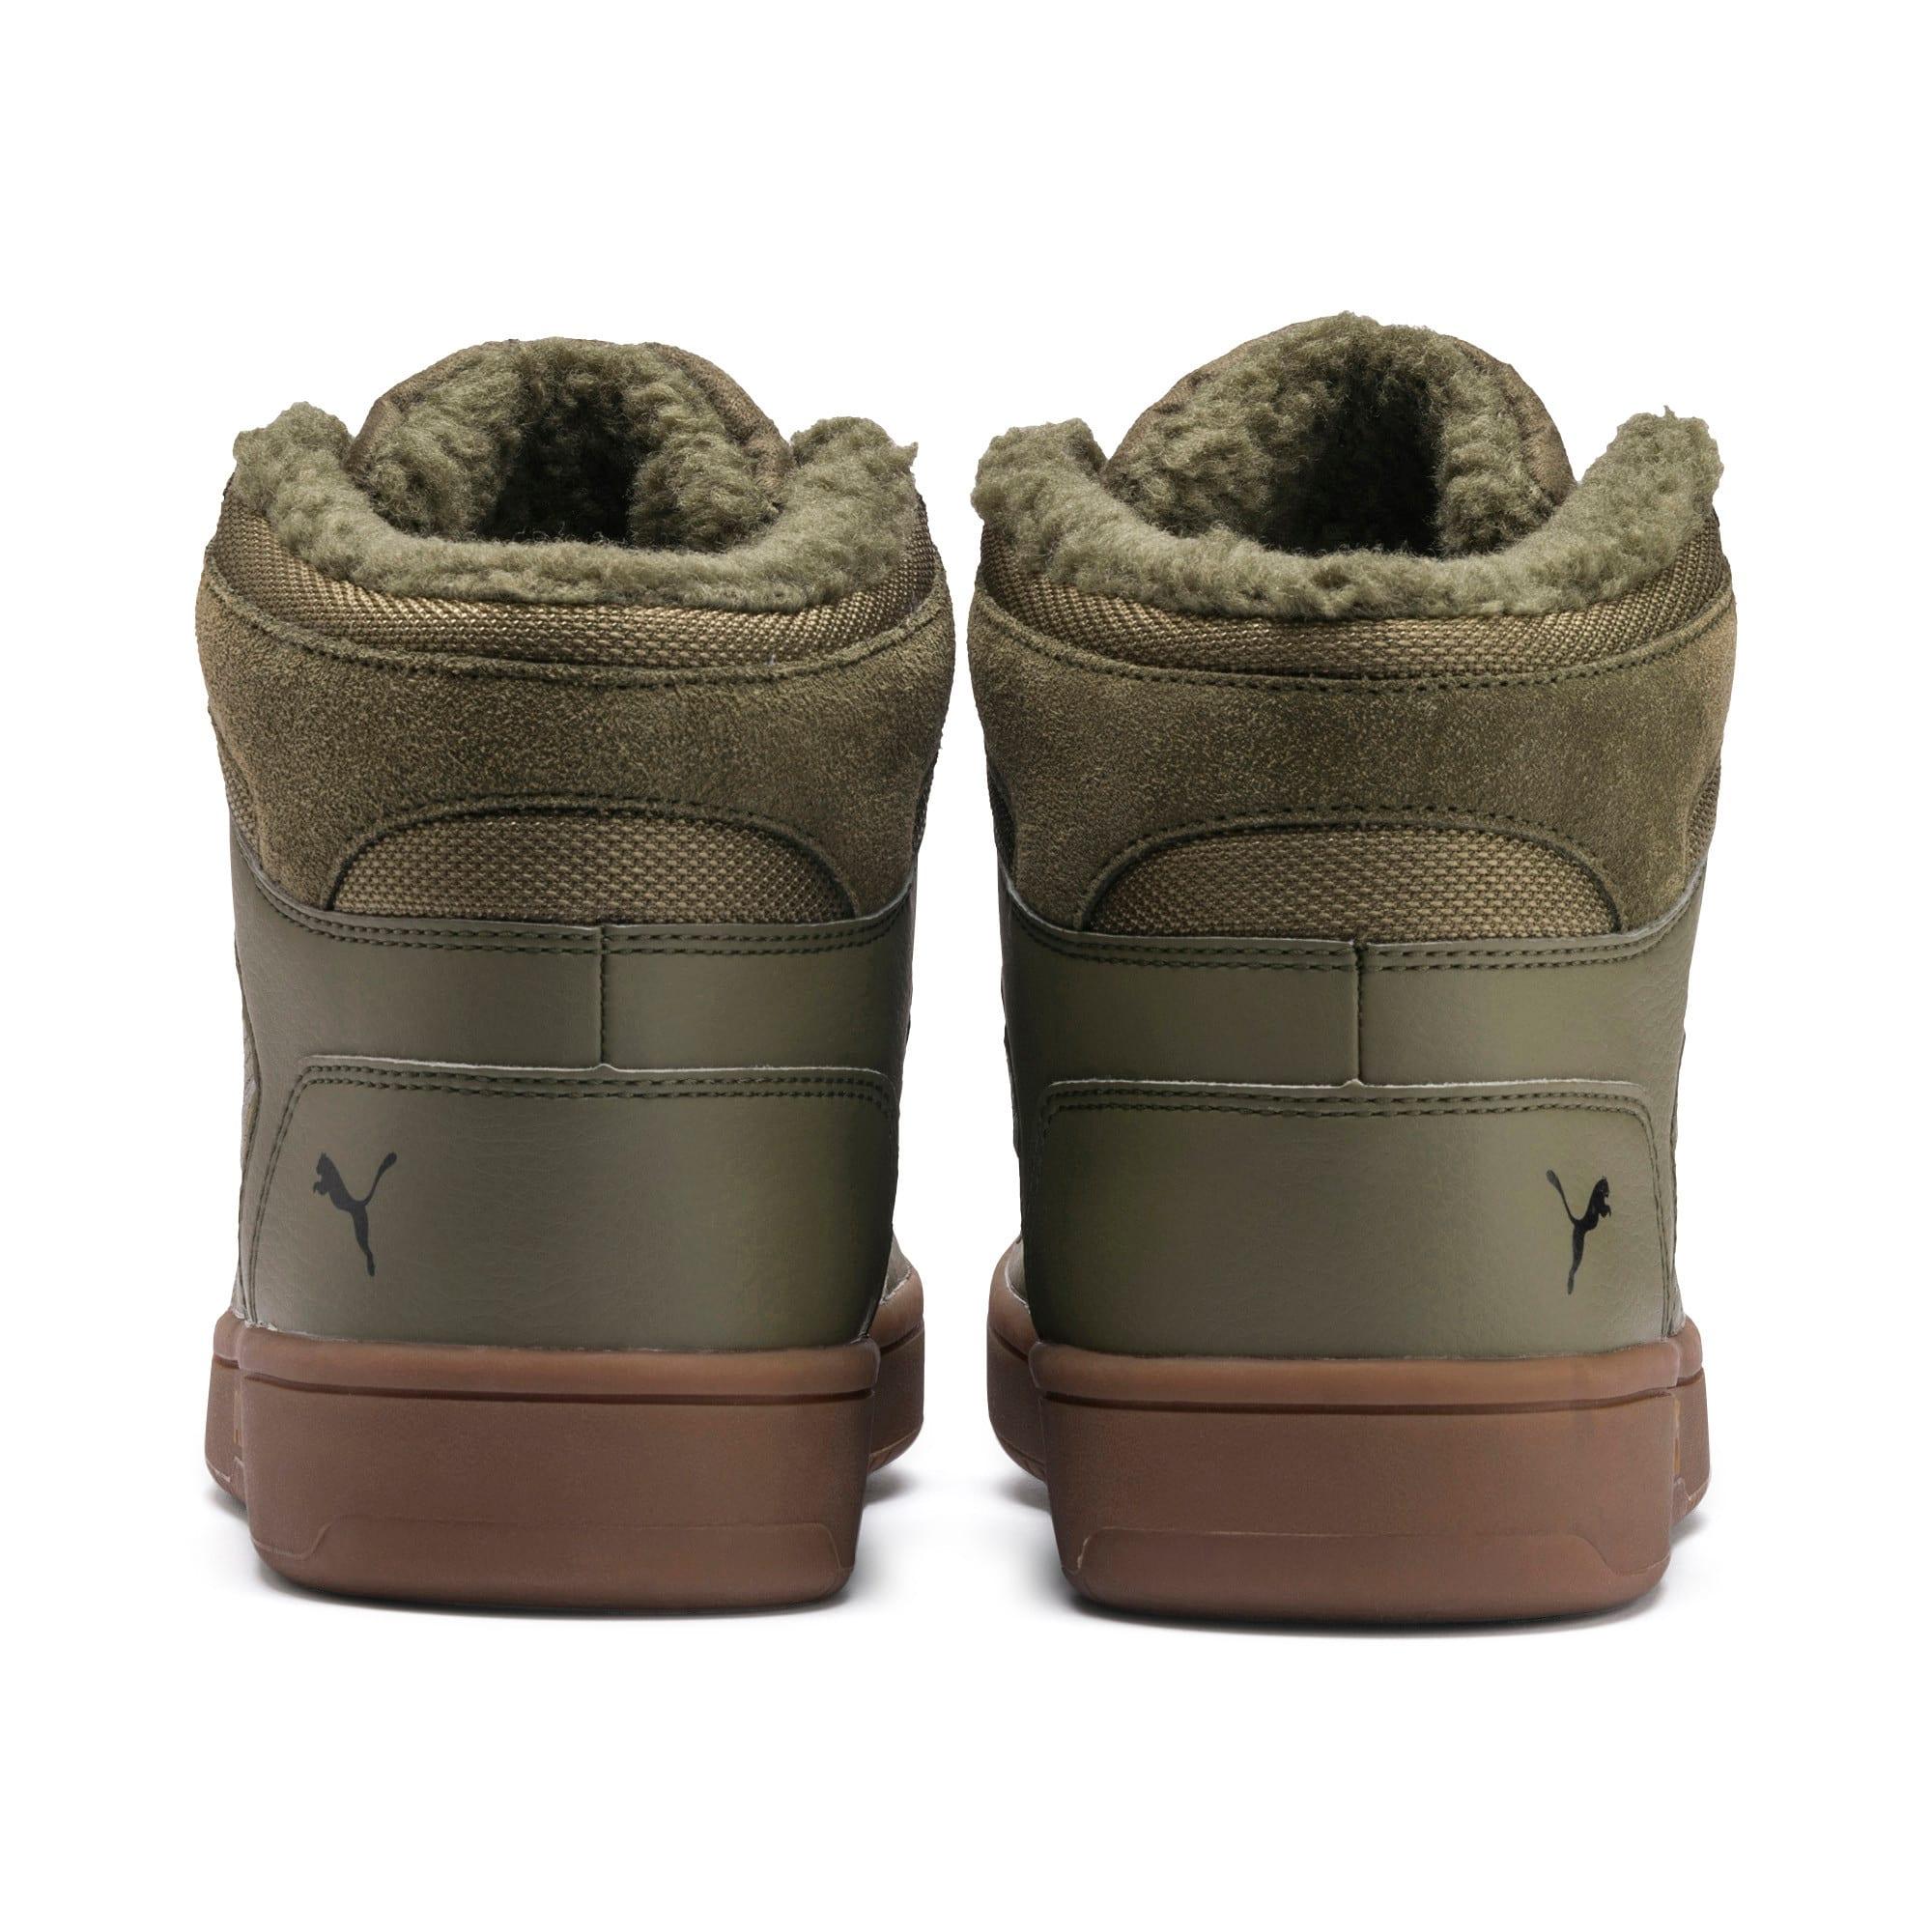 Thumbnail 4 of Rebound Lay Up SD Fur Sneaker, Burnt Olive-Puma Black-Gum, medium